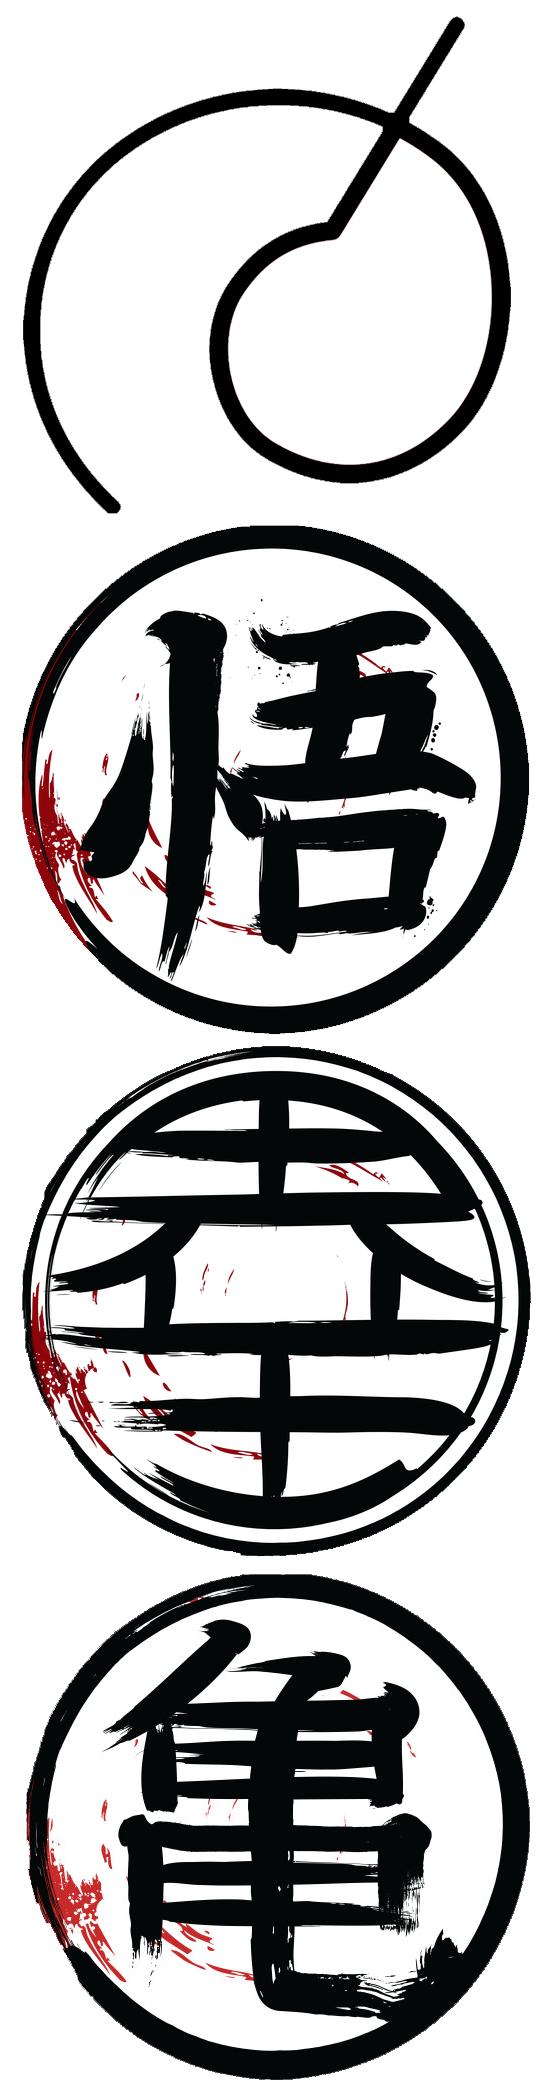 Dbz Kanji Personajes De Goku Pantalla De Goku Dragones